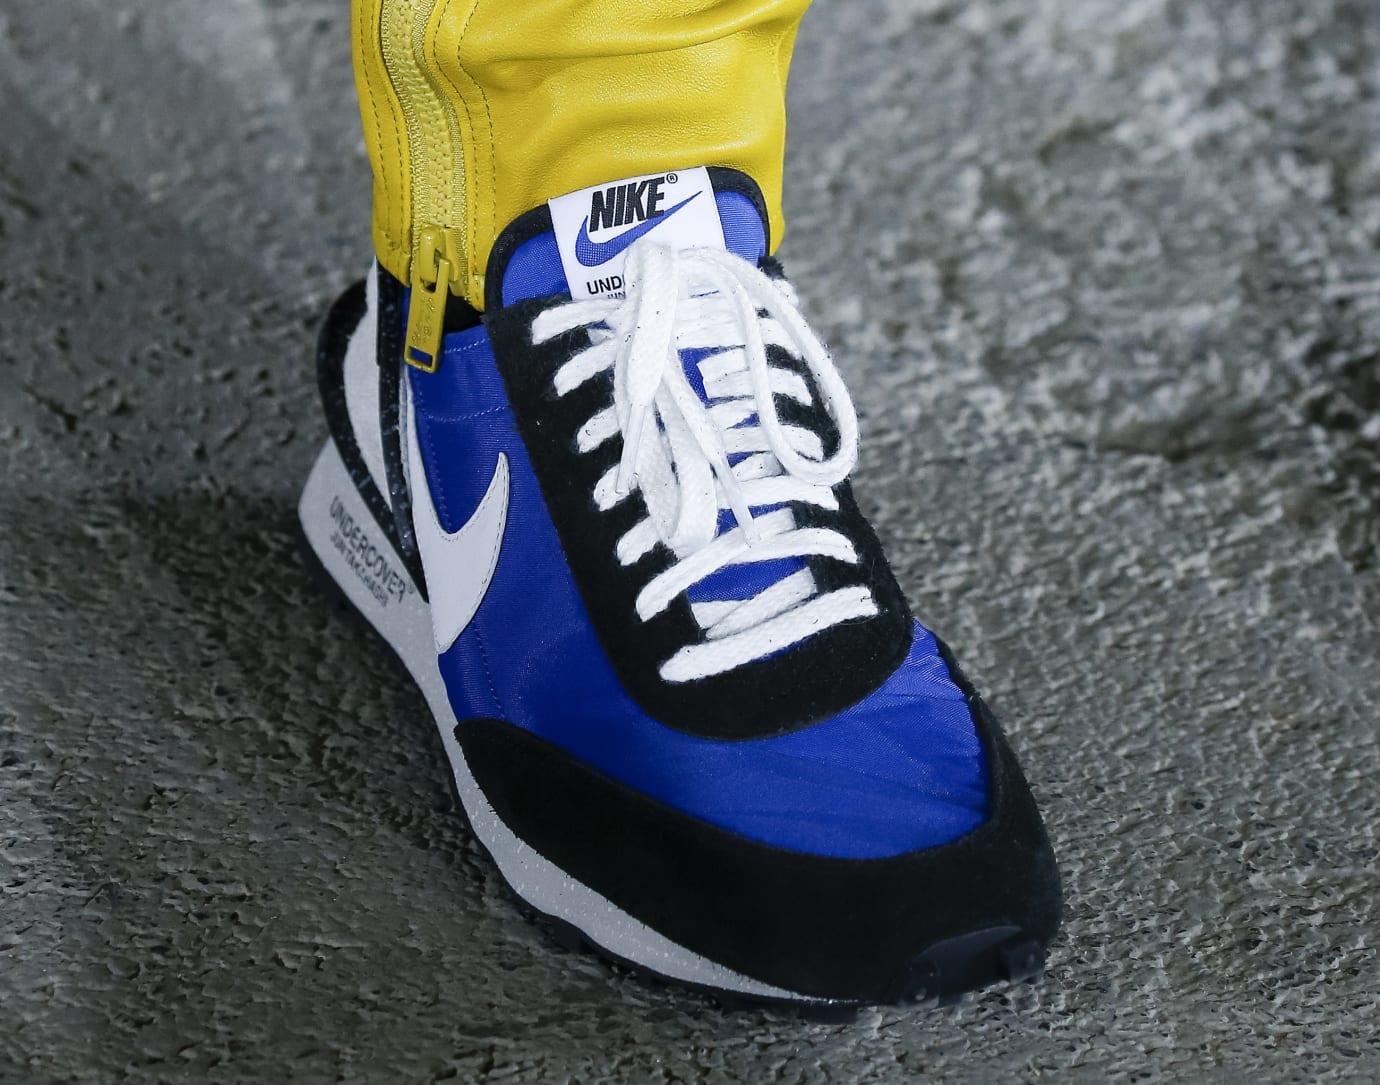 Undercover x Nike Paris Fashion Week Blue Low-Top (Front)